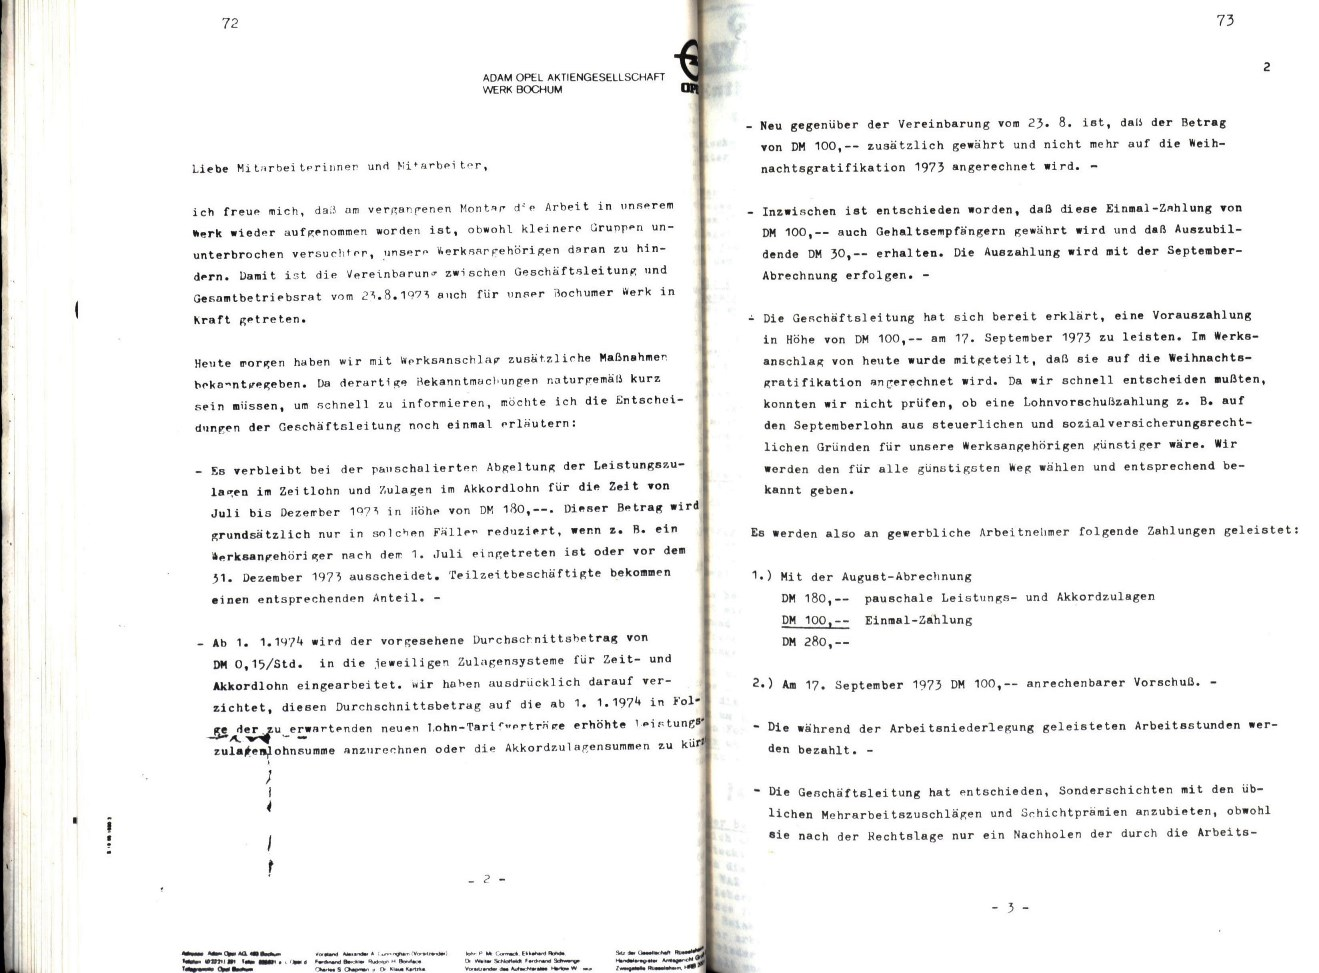 Bochum_IGM_Opel_PG_Opel_streikt_1973_038